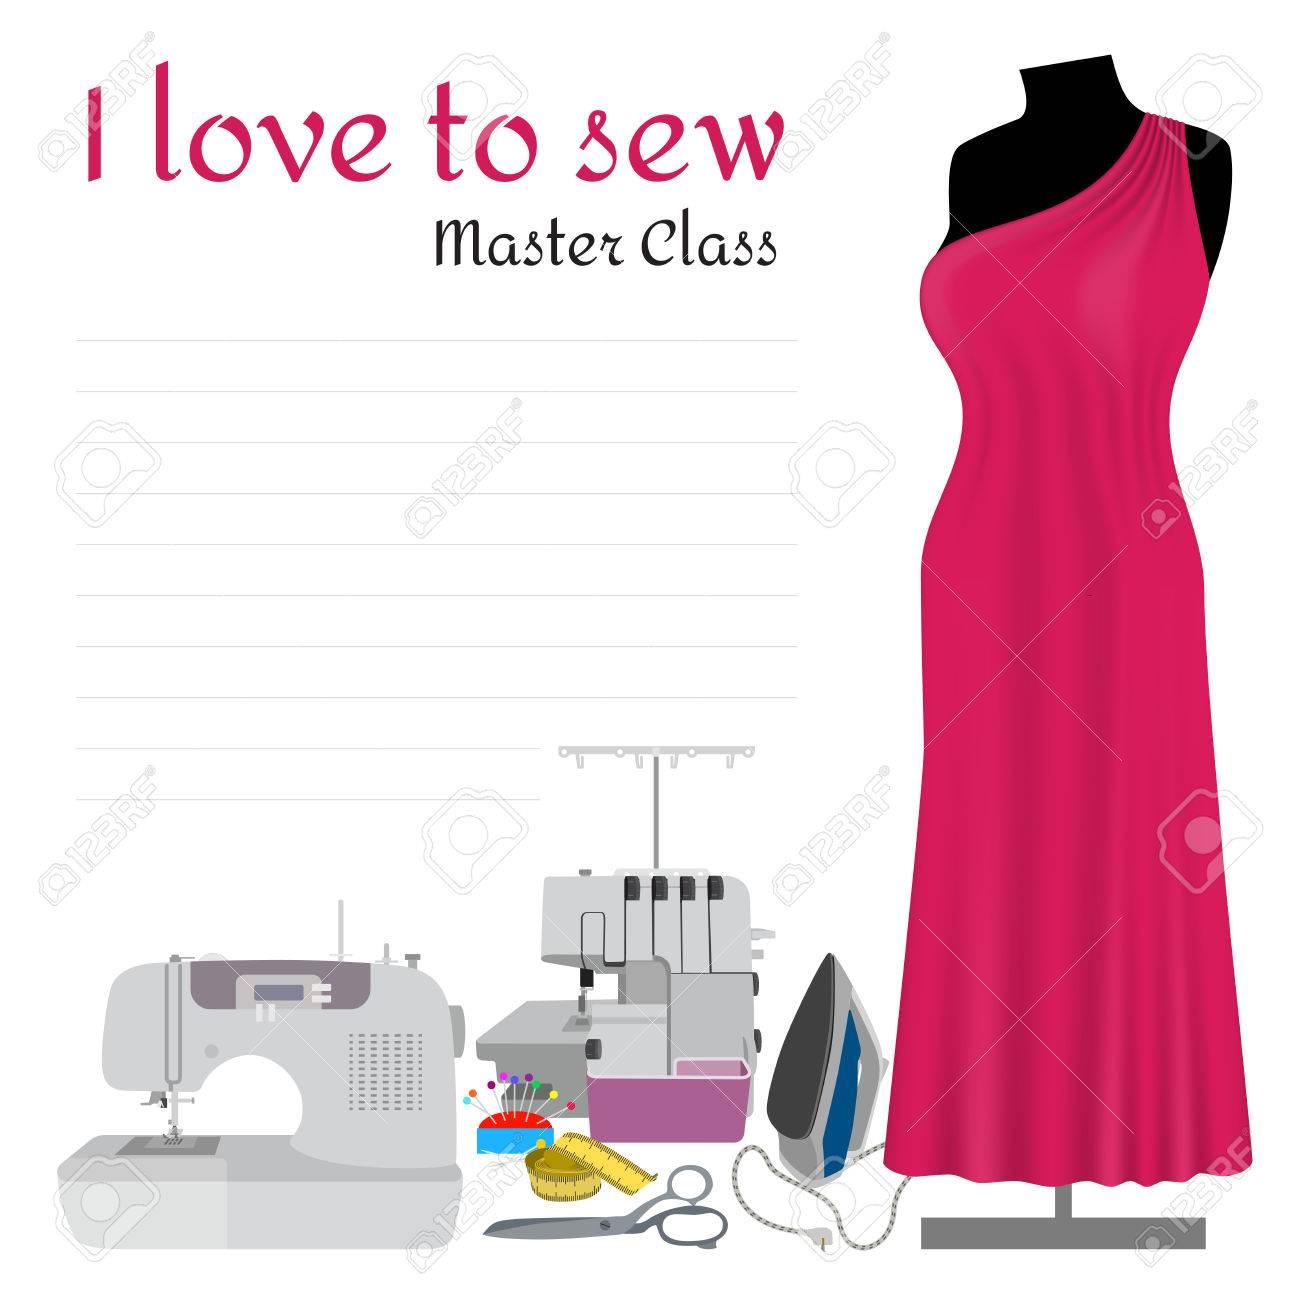 Sewing master class invitation collection items for making dress sewing master class invitation collection items for making dress sewing machine overlock stopboris Choice Image